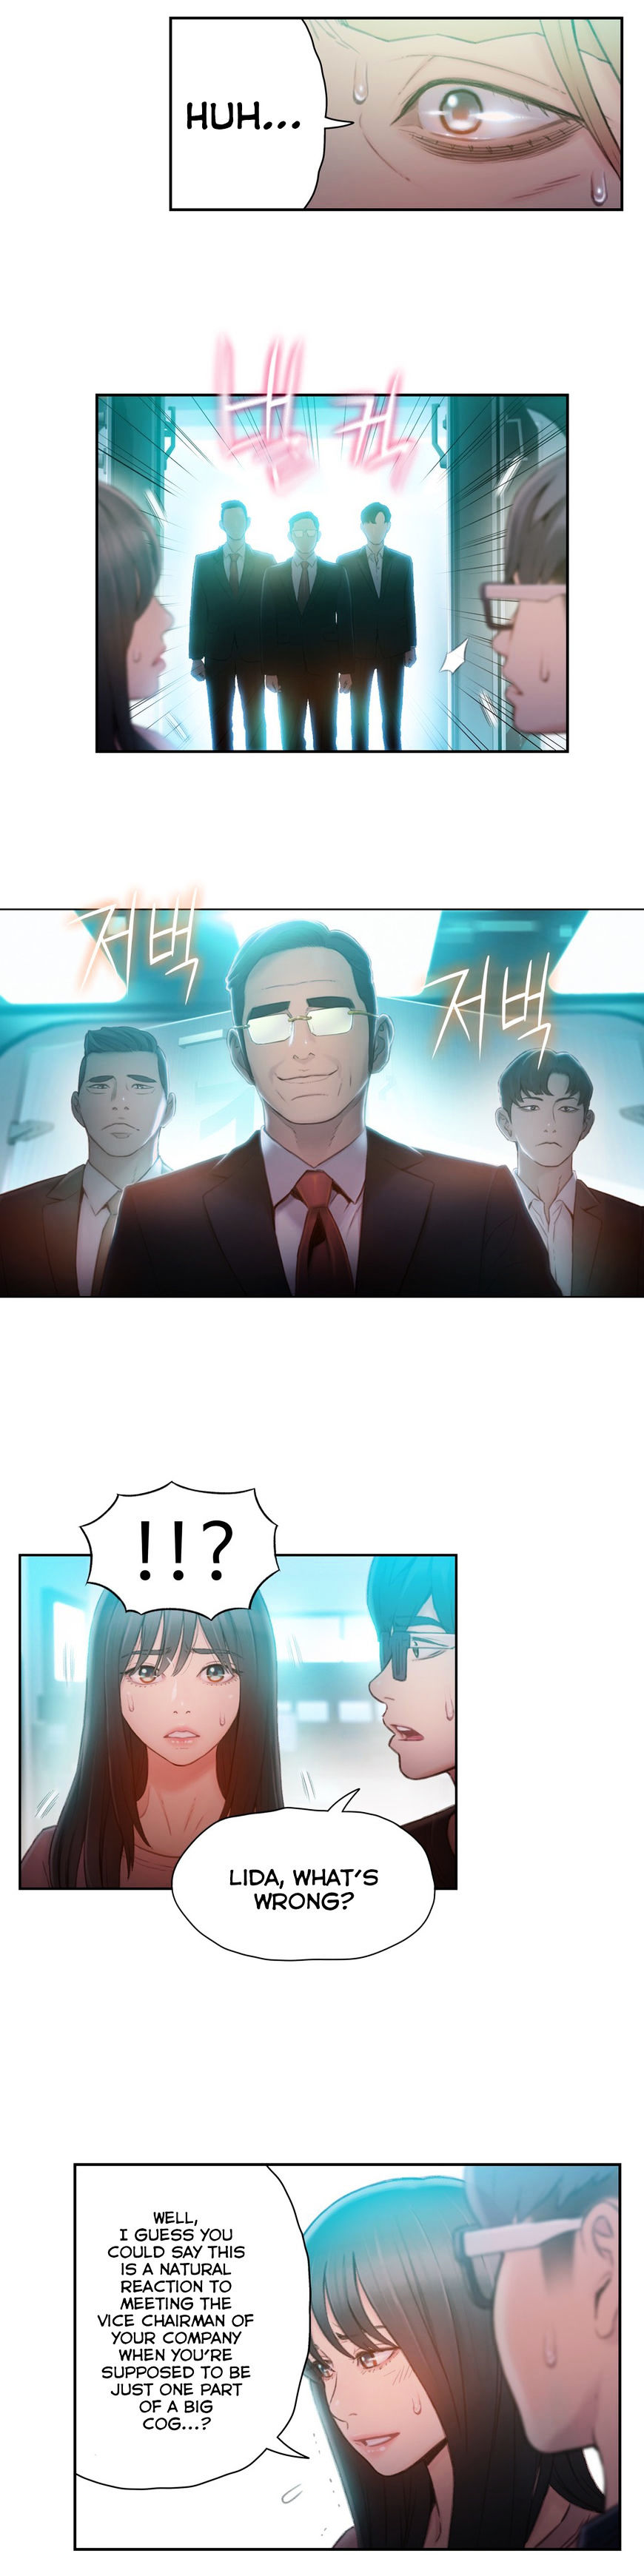 Sweet Guy Chapter 73 Full Manga Read Scan Image 9